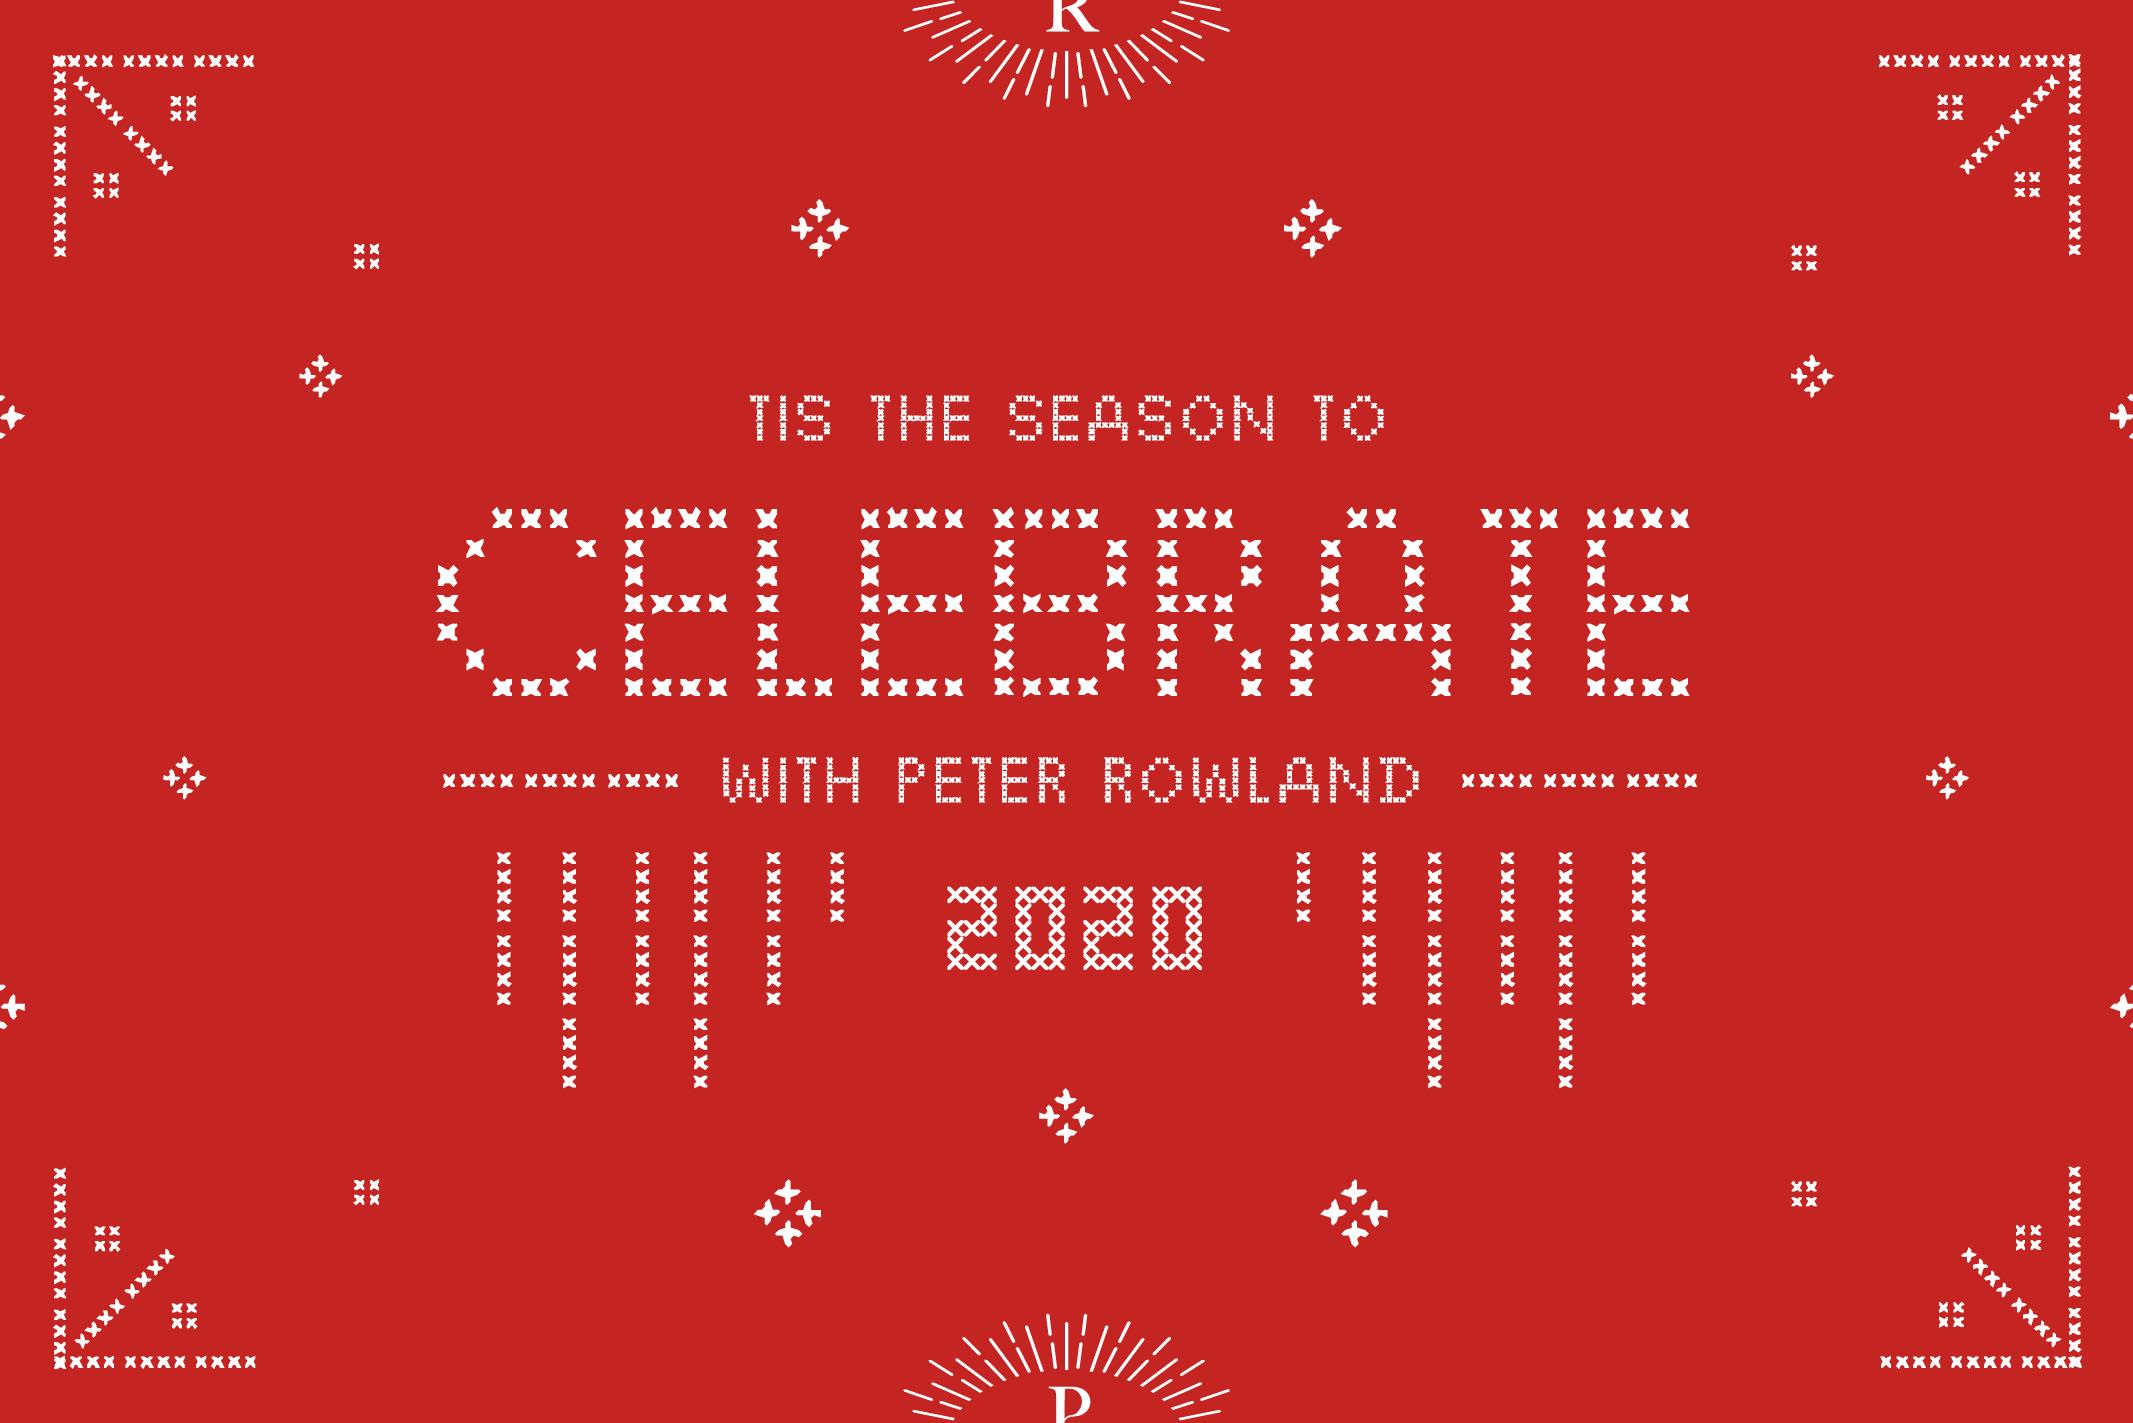 PETER ROWLAND CHRISTMAS 2020 CELEBRATE